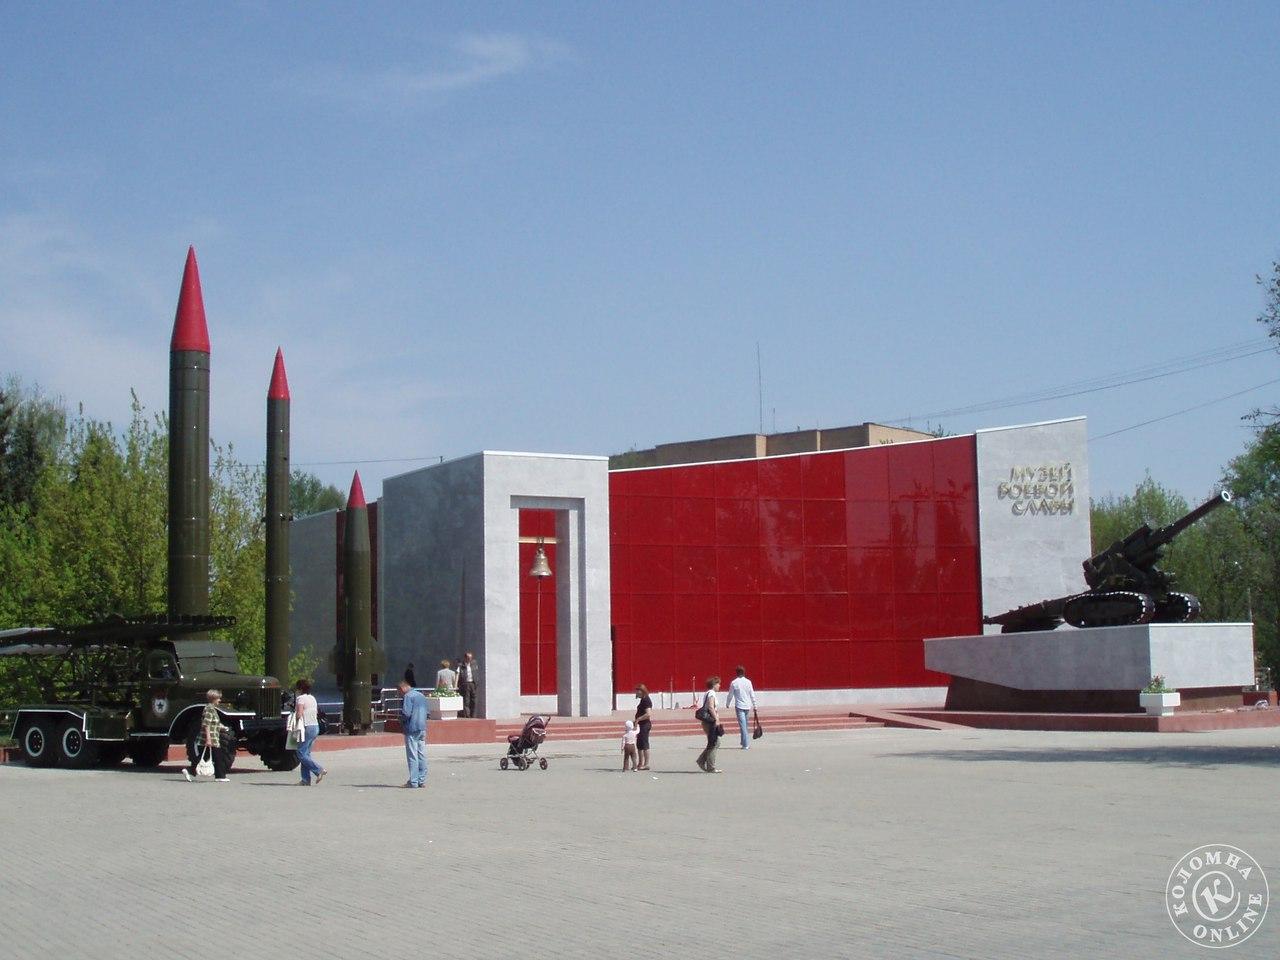 Анонсы: Музей боевой славы